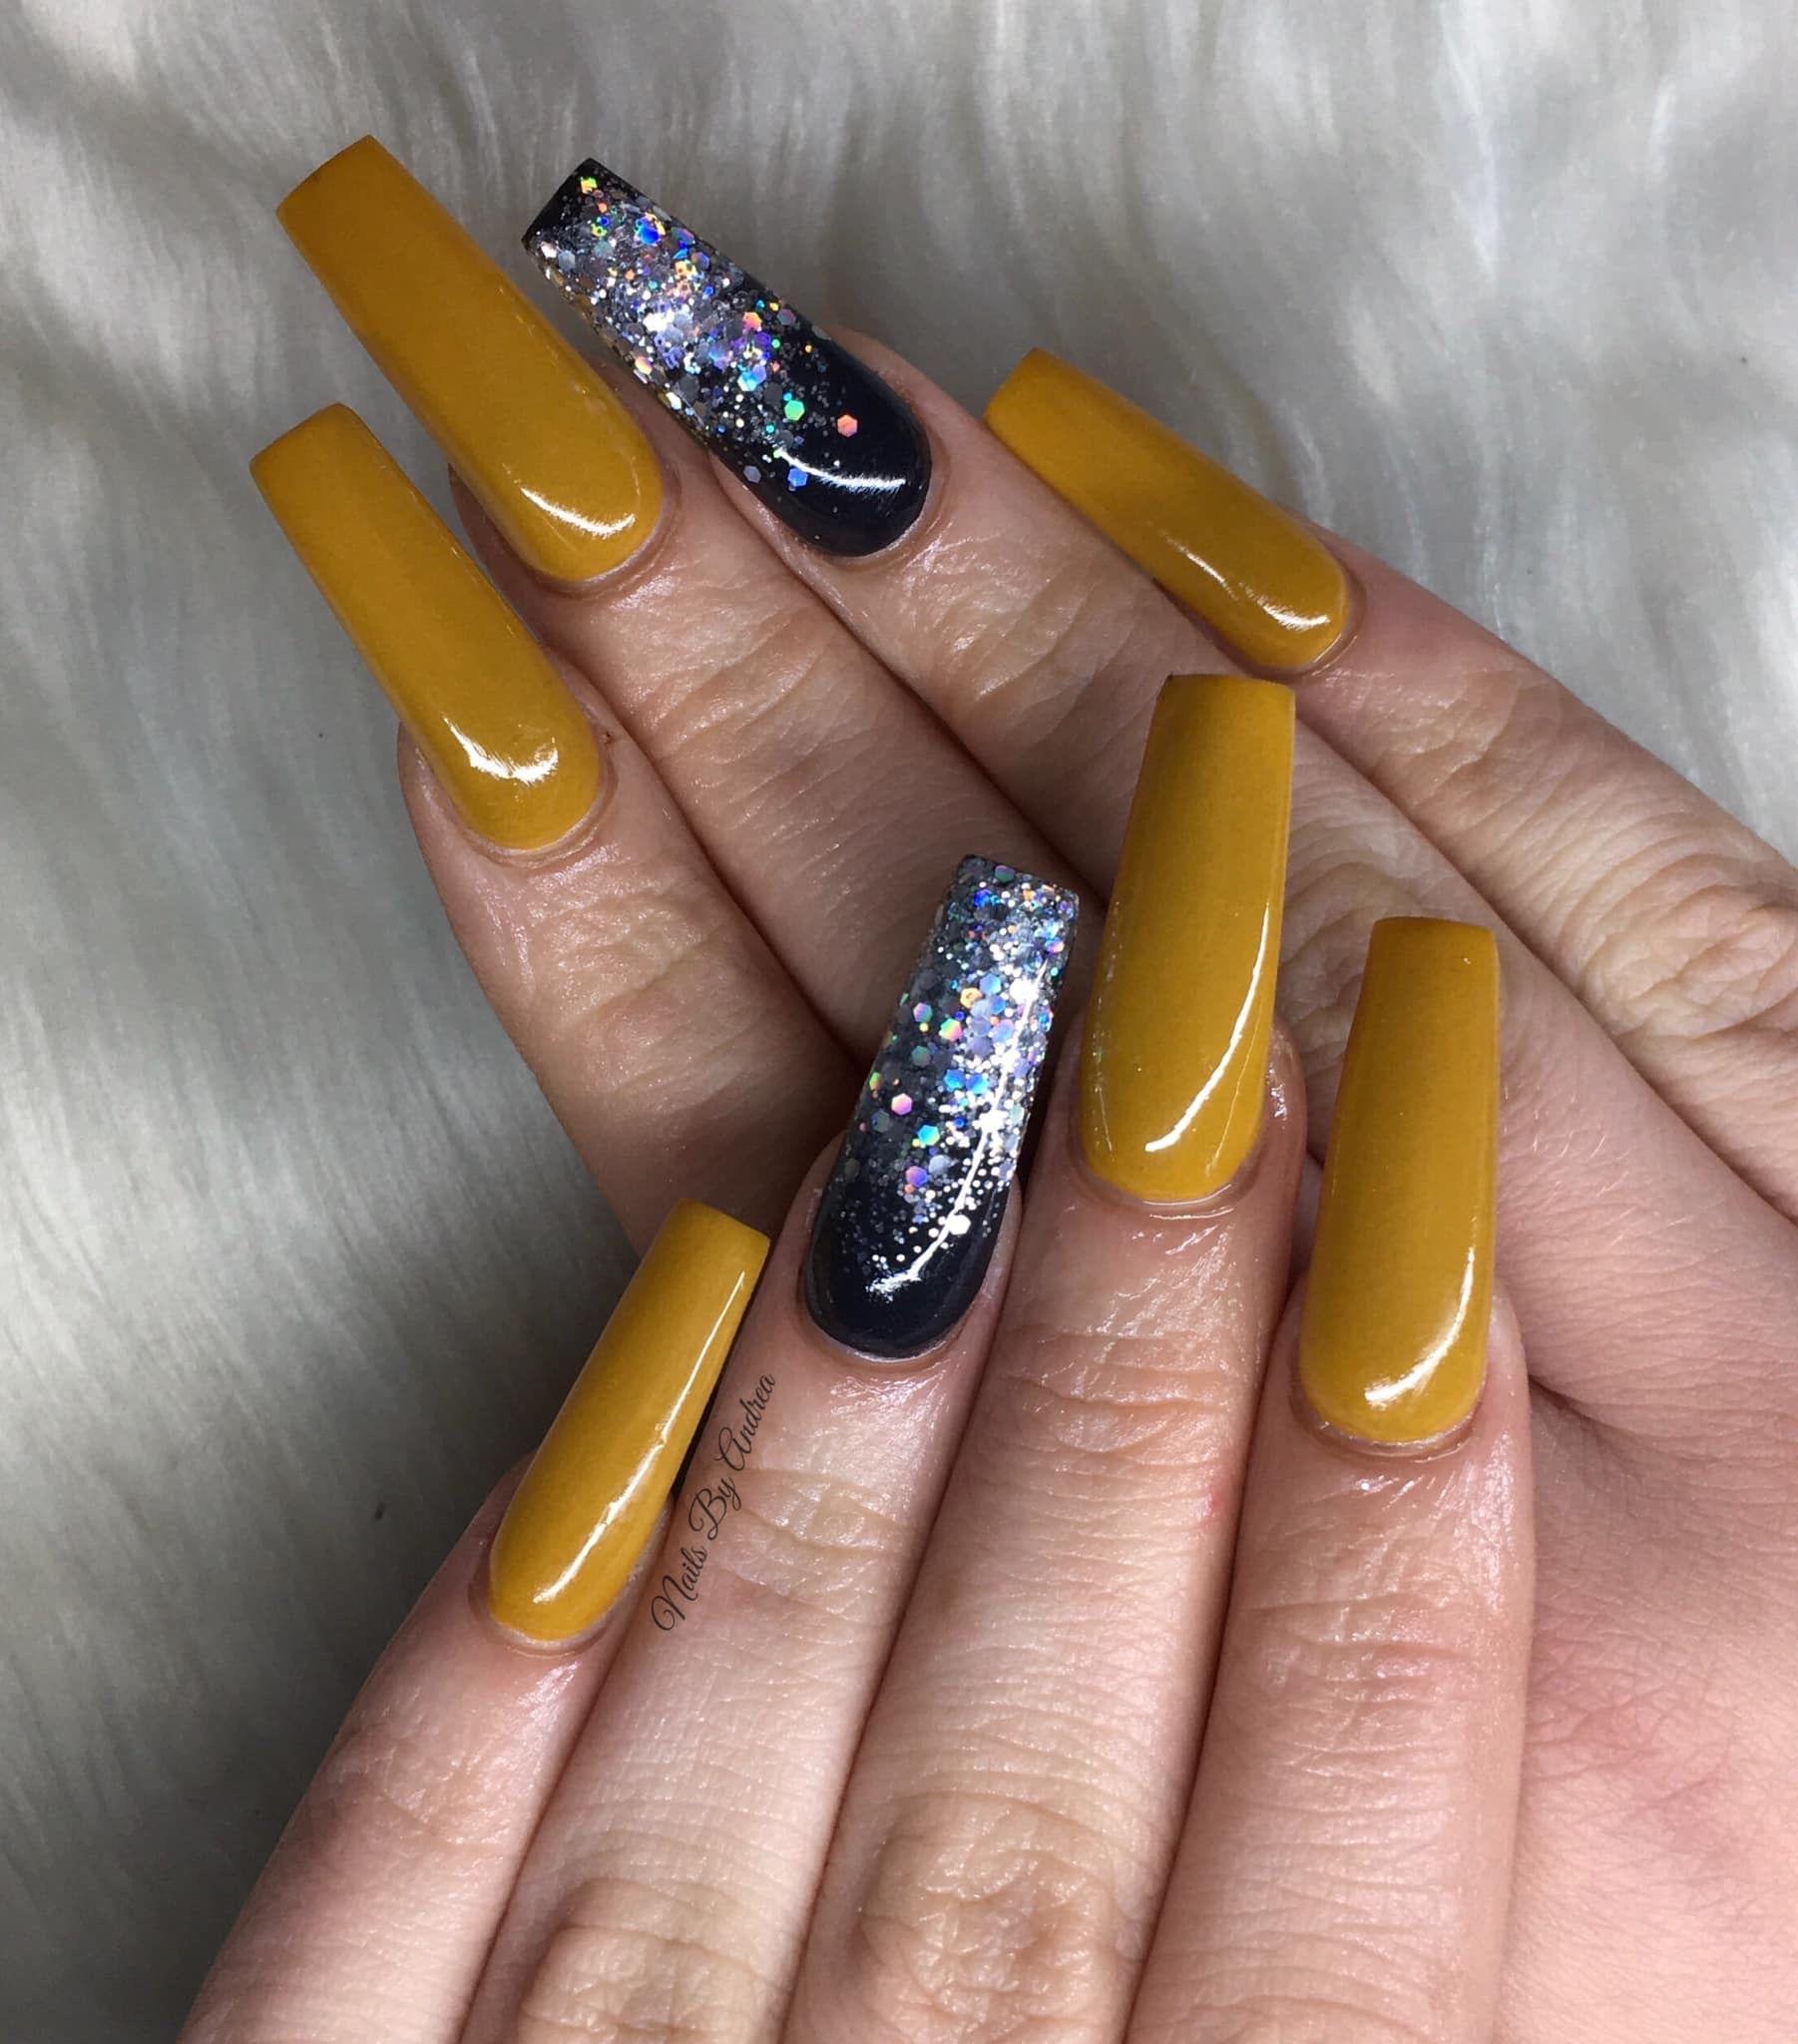 Pin by Jo Capper on Nail Inspo | Glitter nails acrylic ...